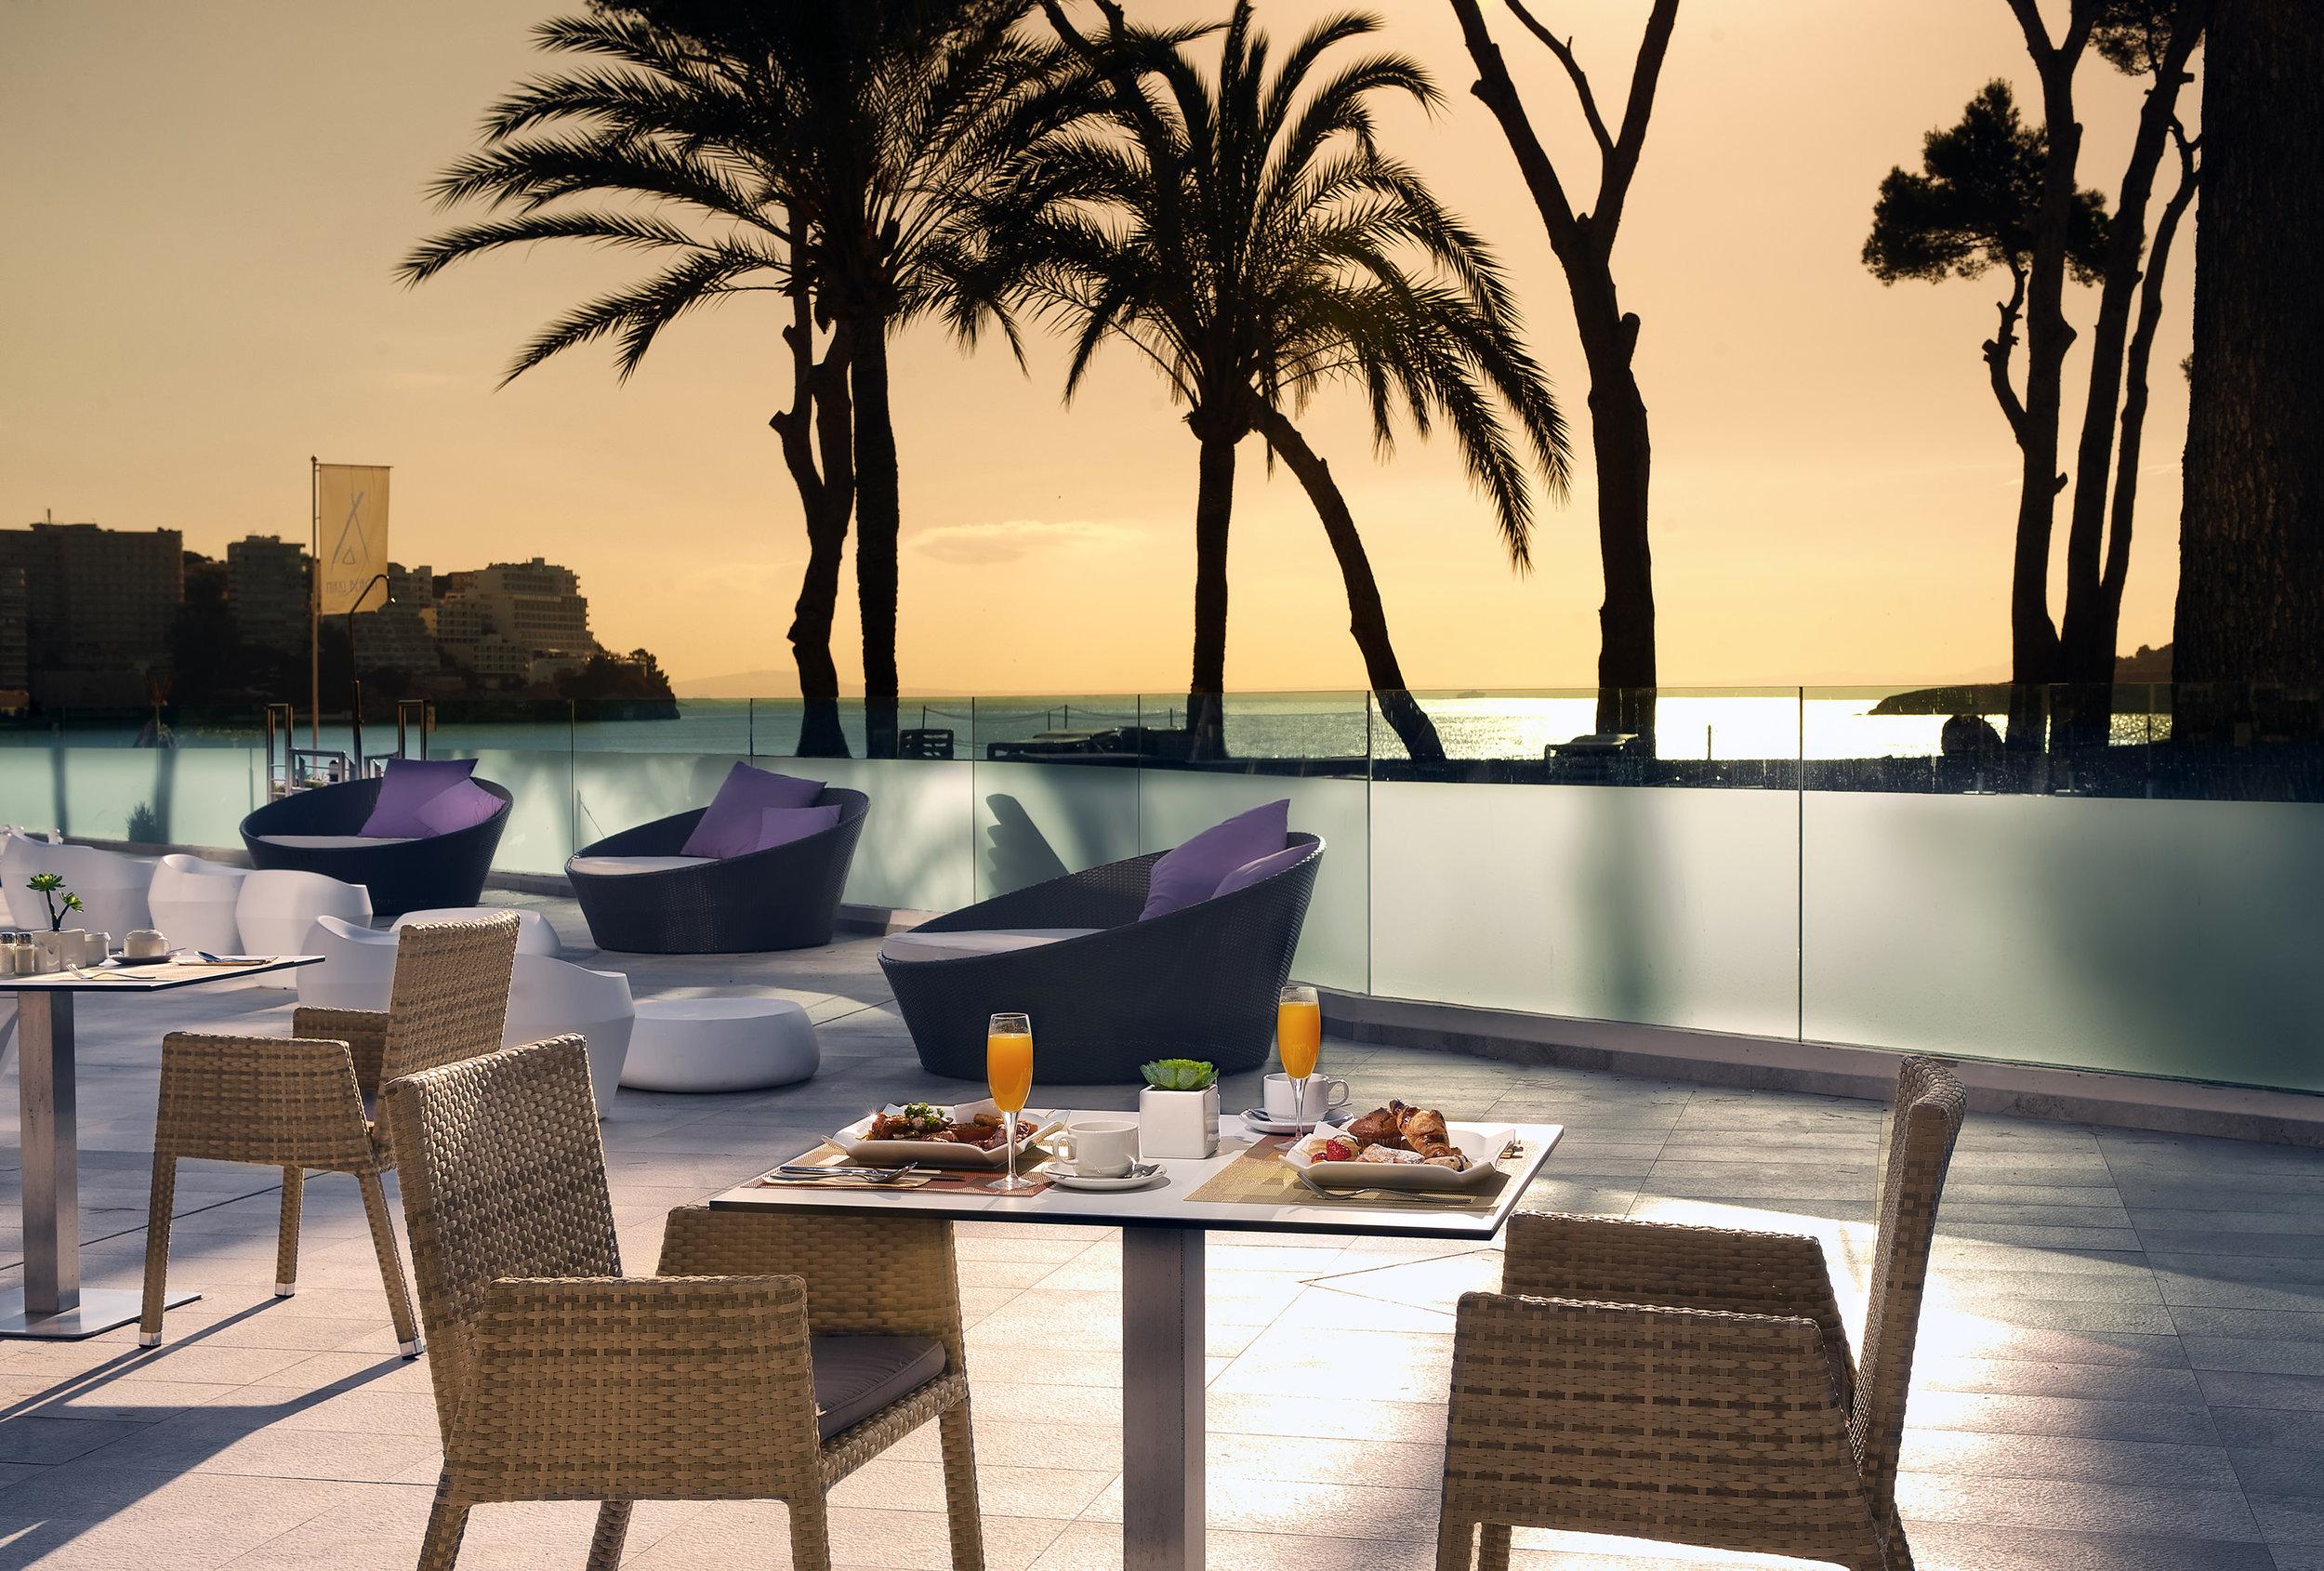 23eME_Mallorca-BreakfastTerrace.jpg